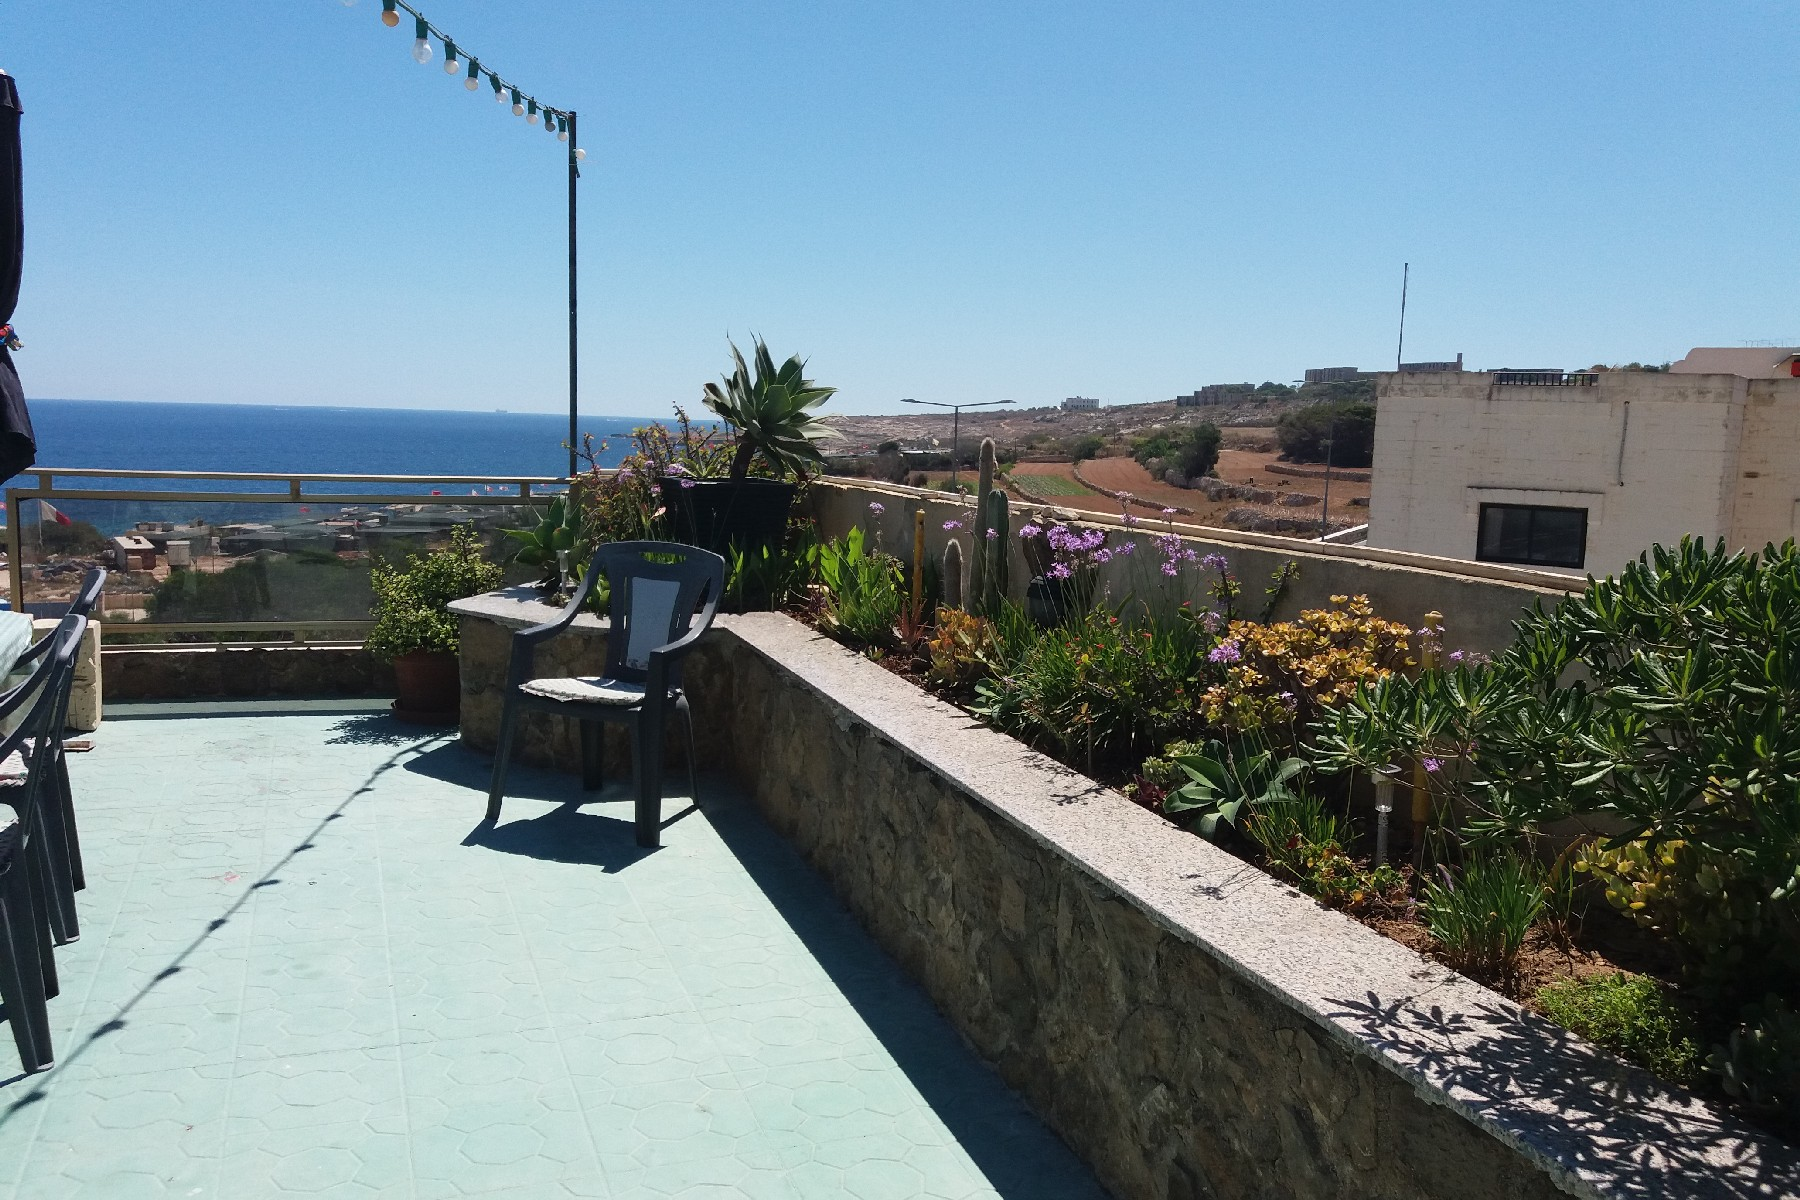 شقة للـ Sale في Seafront Duplex Apartment Bahar ic Caghaq, Malta